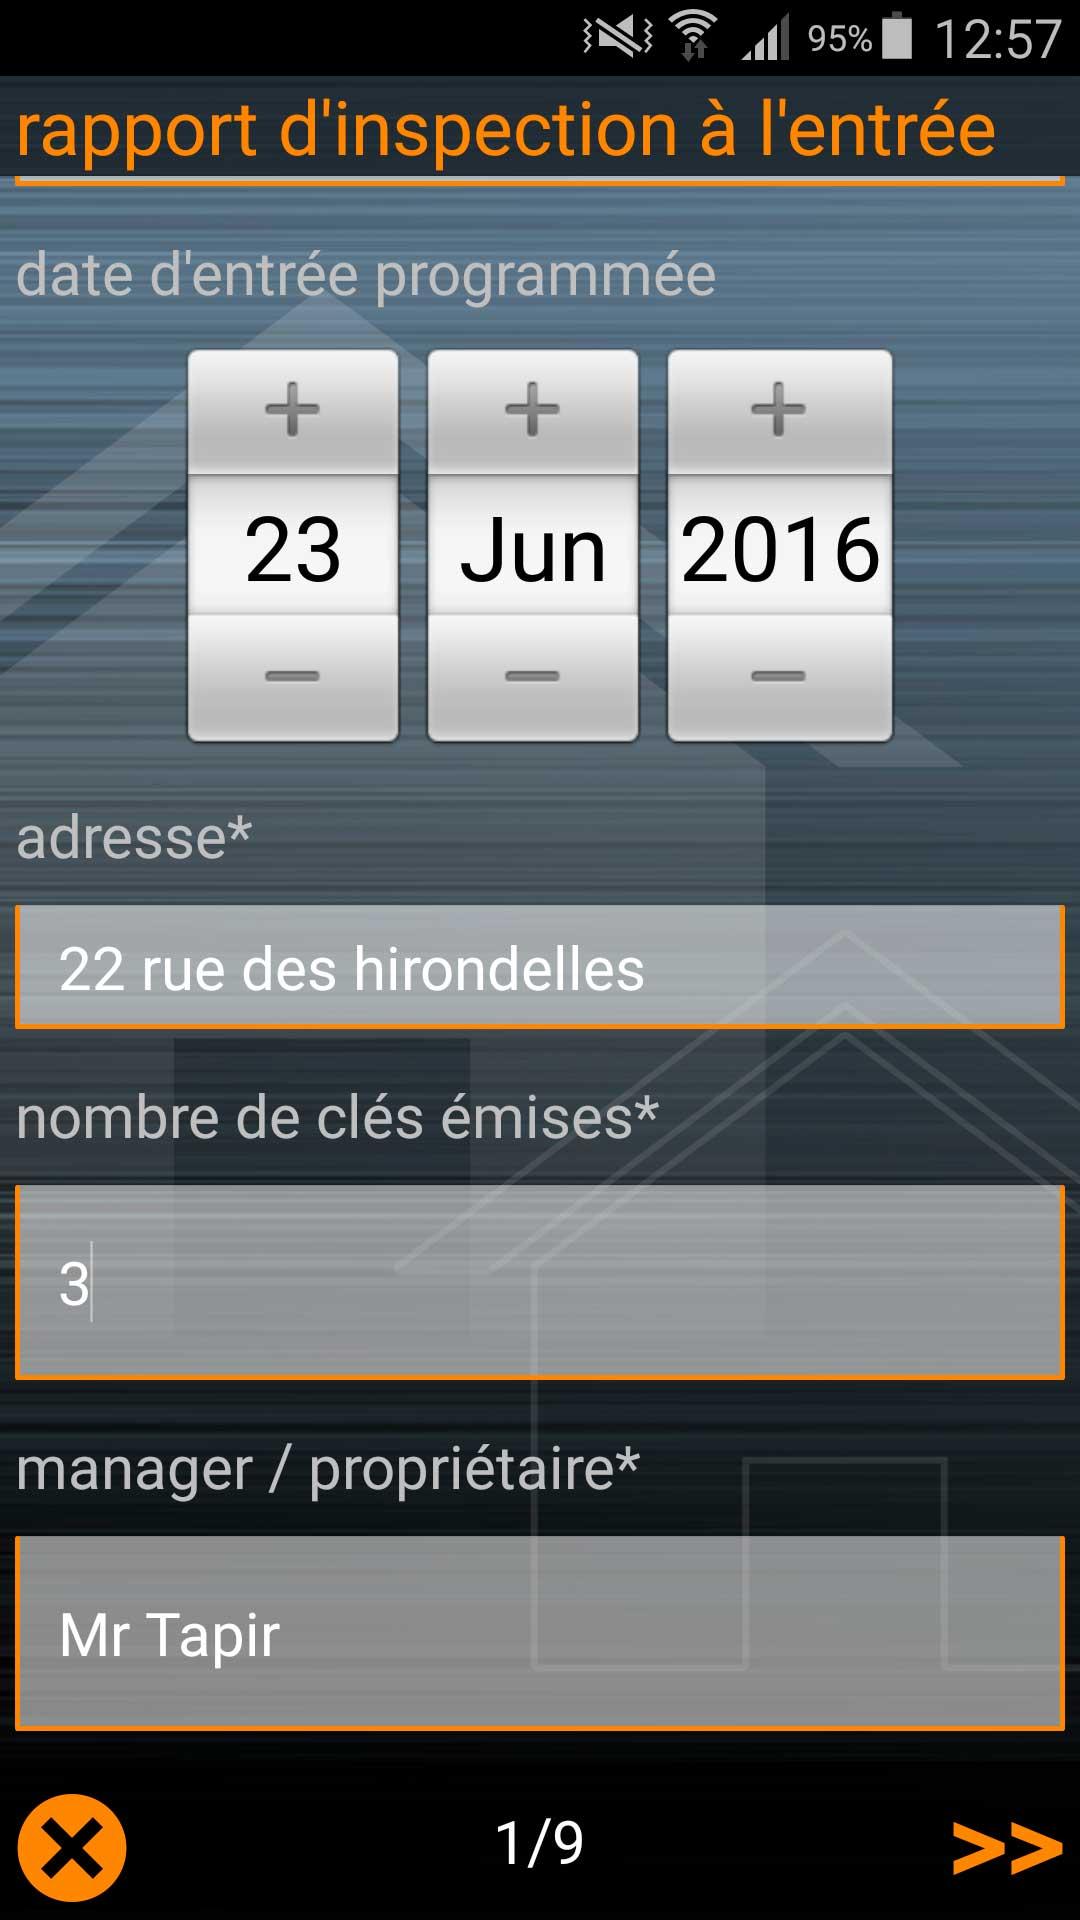 ginstr_app_flatHandoverChecklist_FR_3